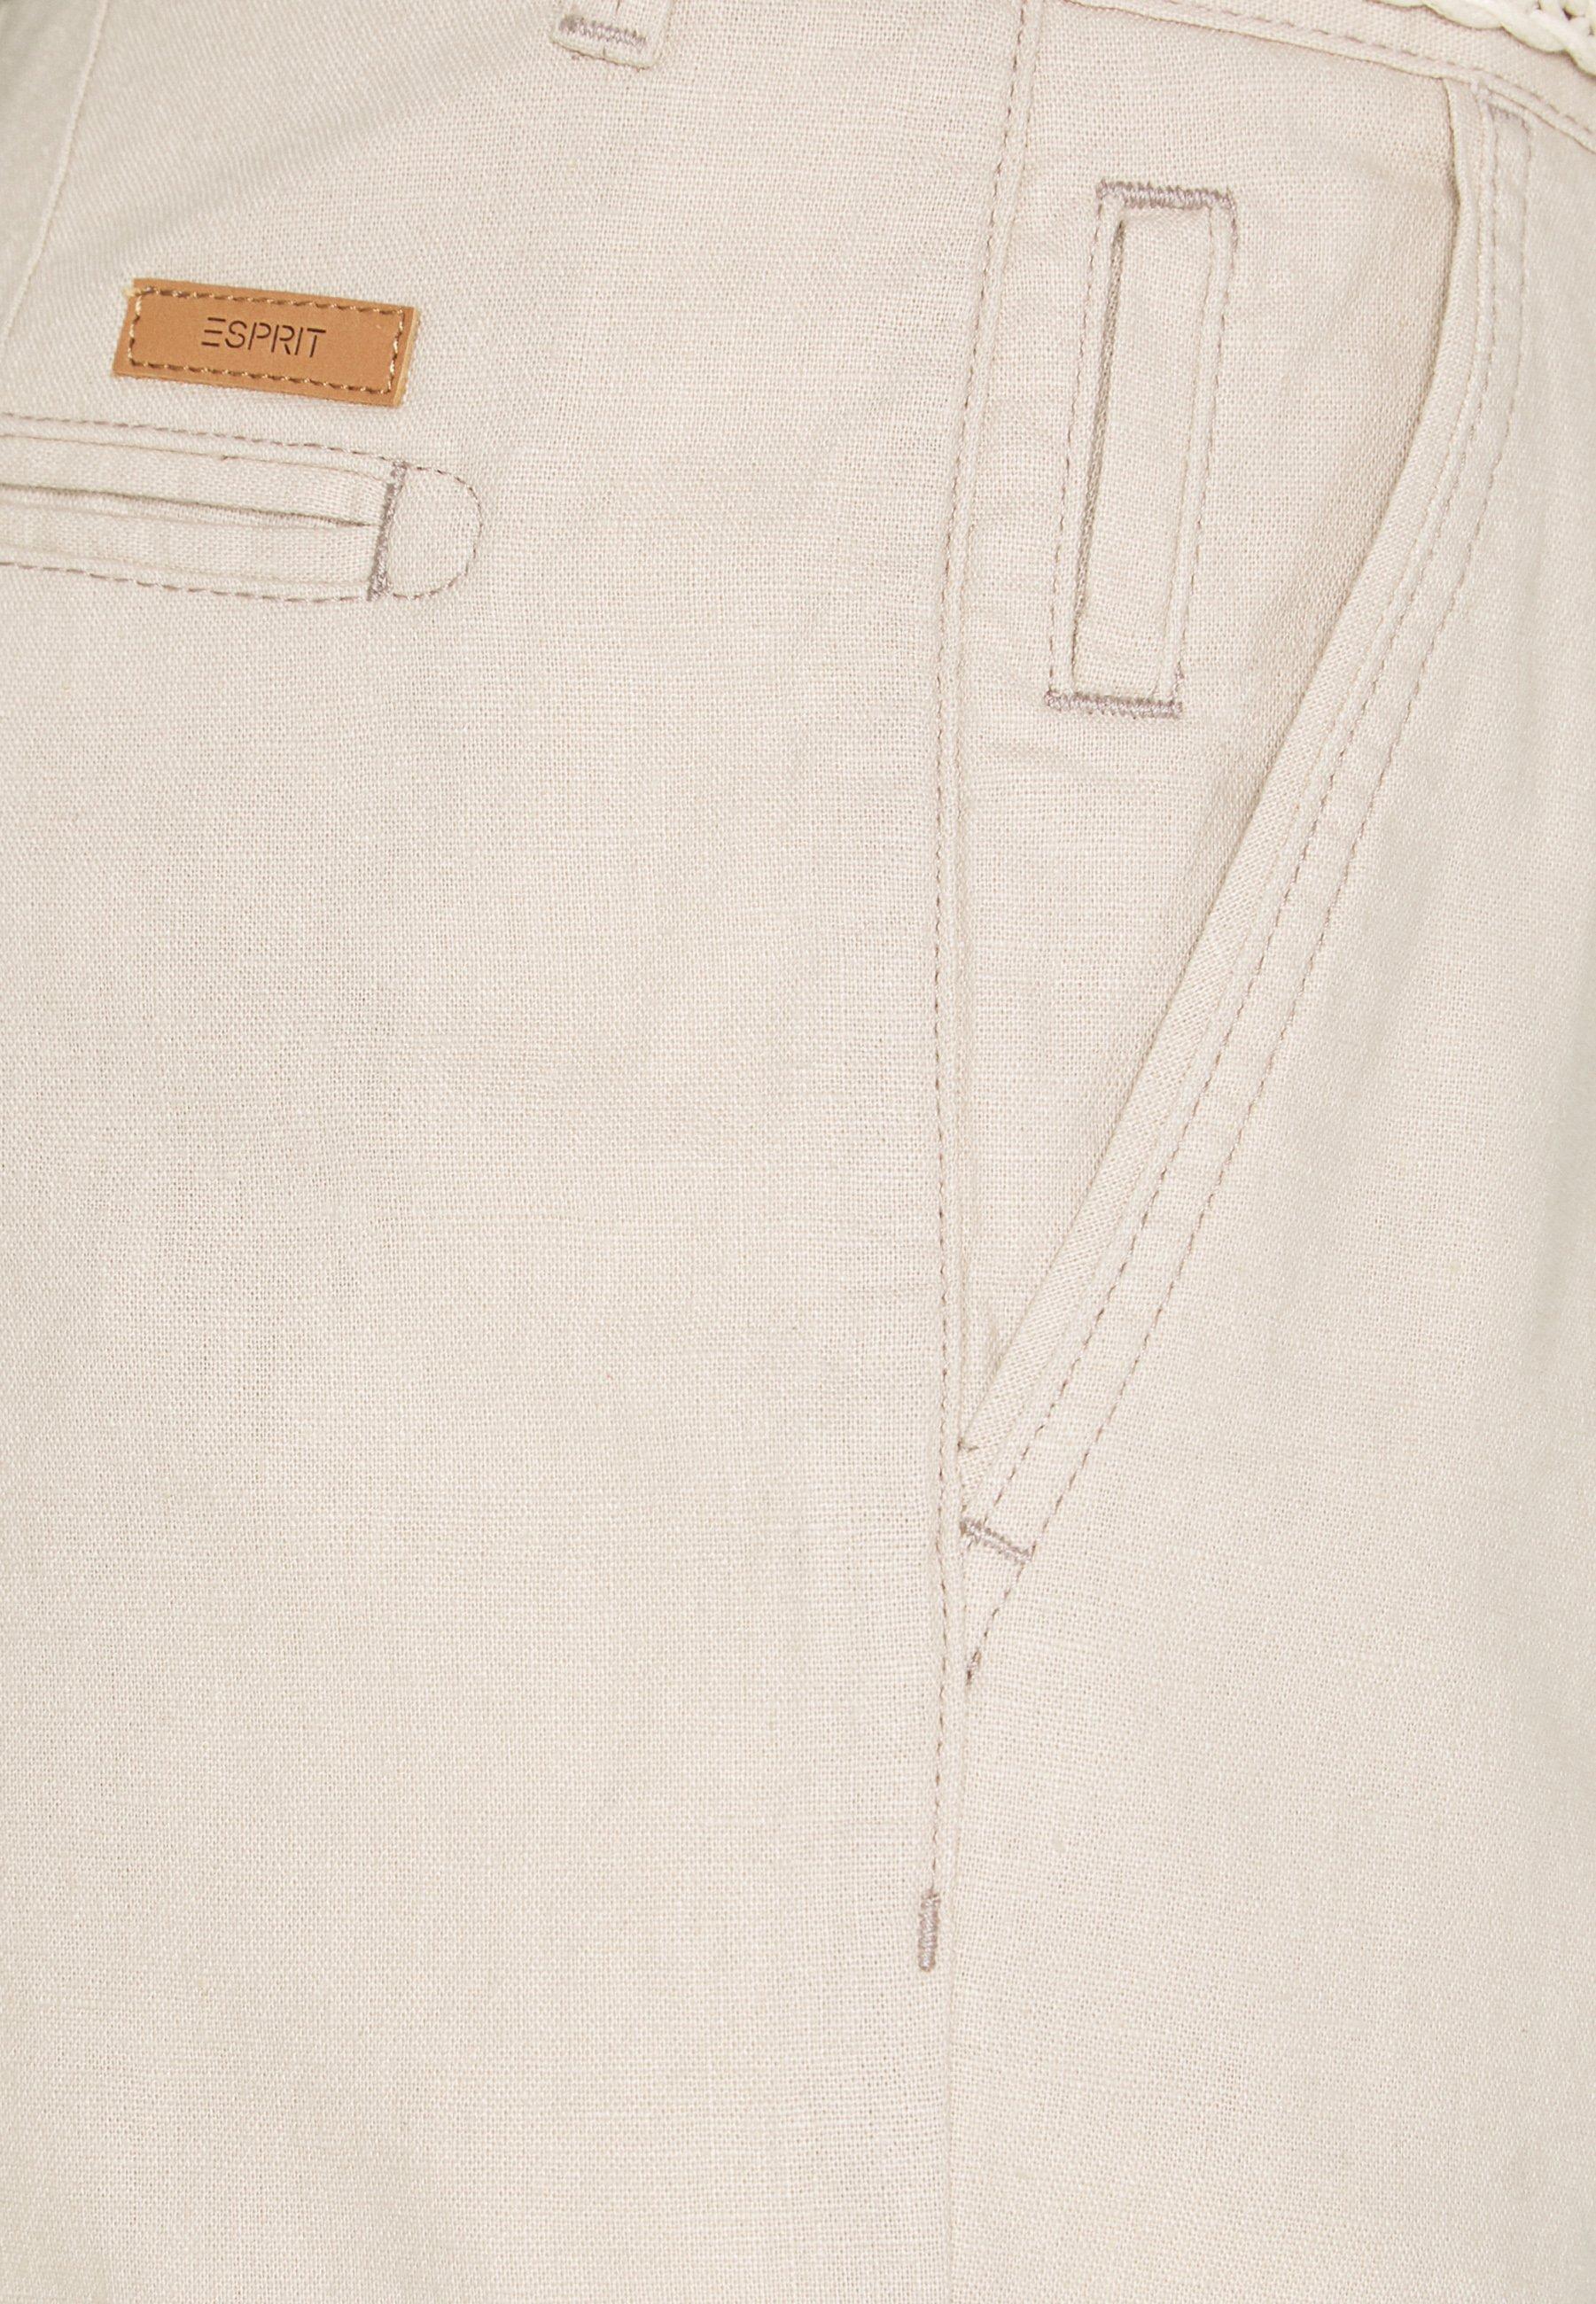 Esprit Basic - Shorts Light Beige